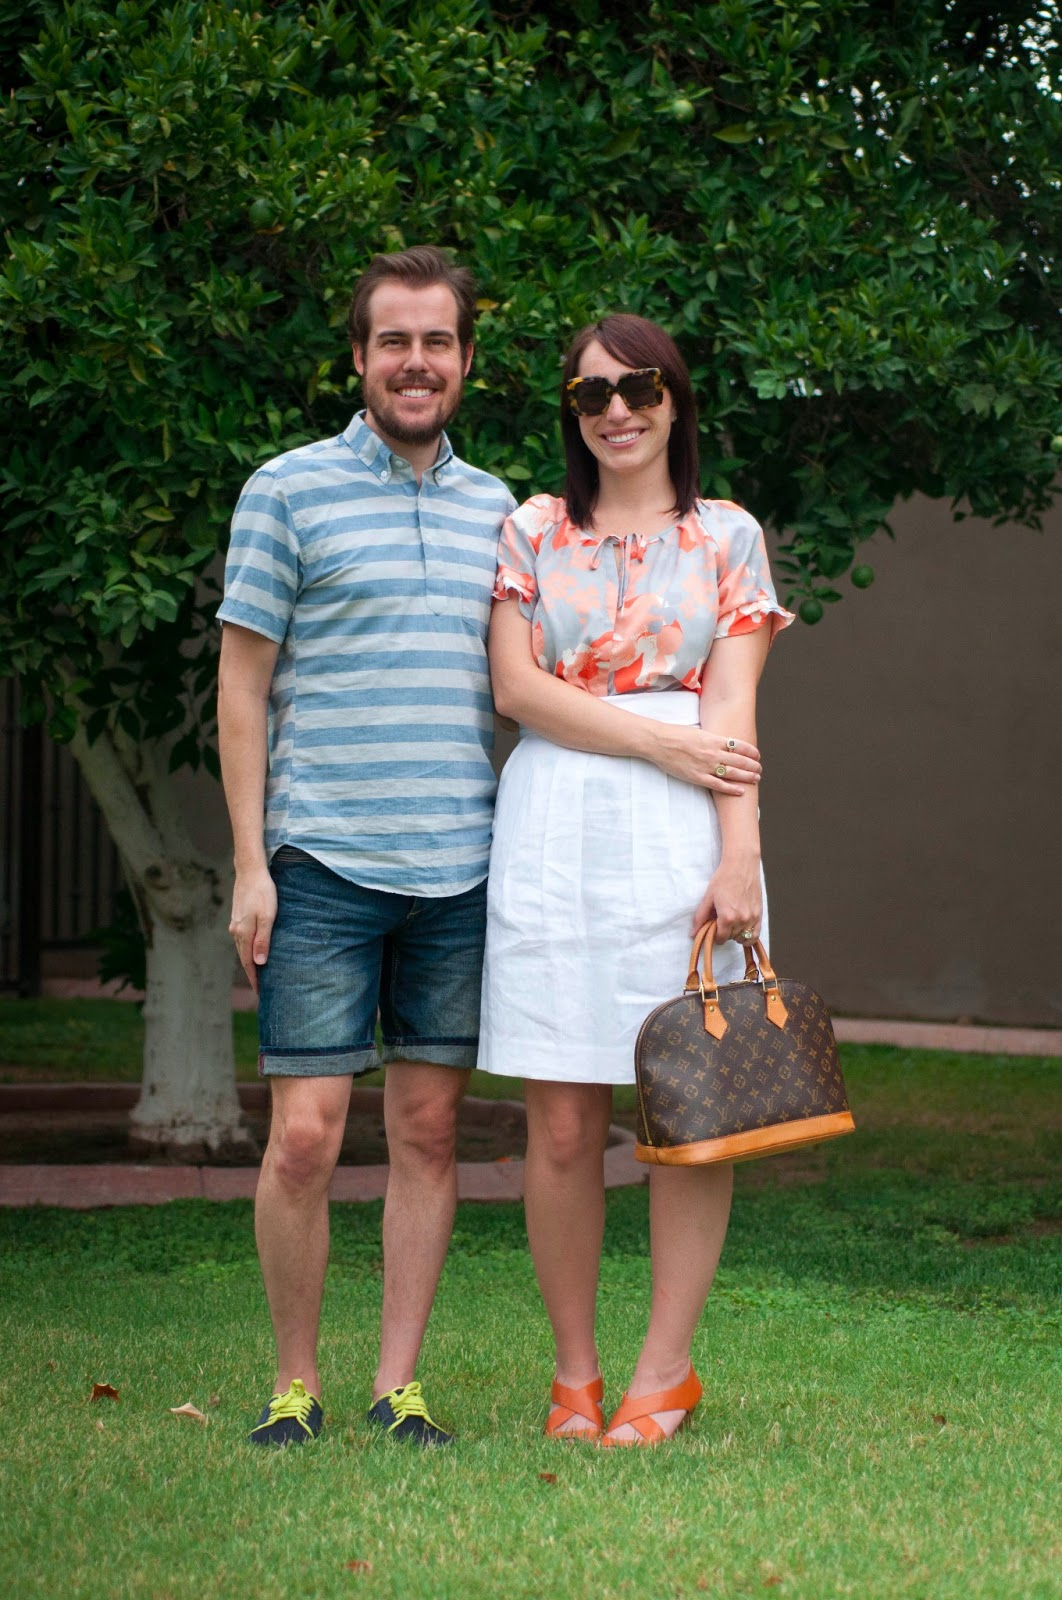 couples fashion, style blog, mens fashion, zara ootd, banana republic, silk blouse, ootd, karen walker sunglasses